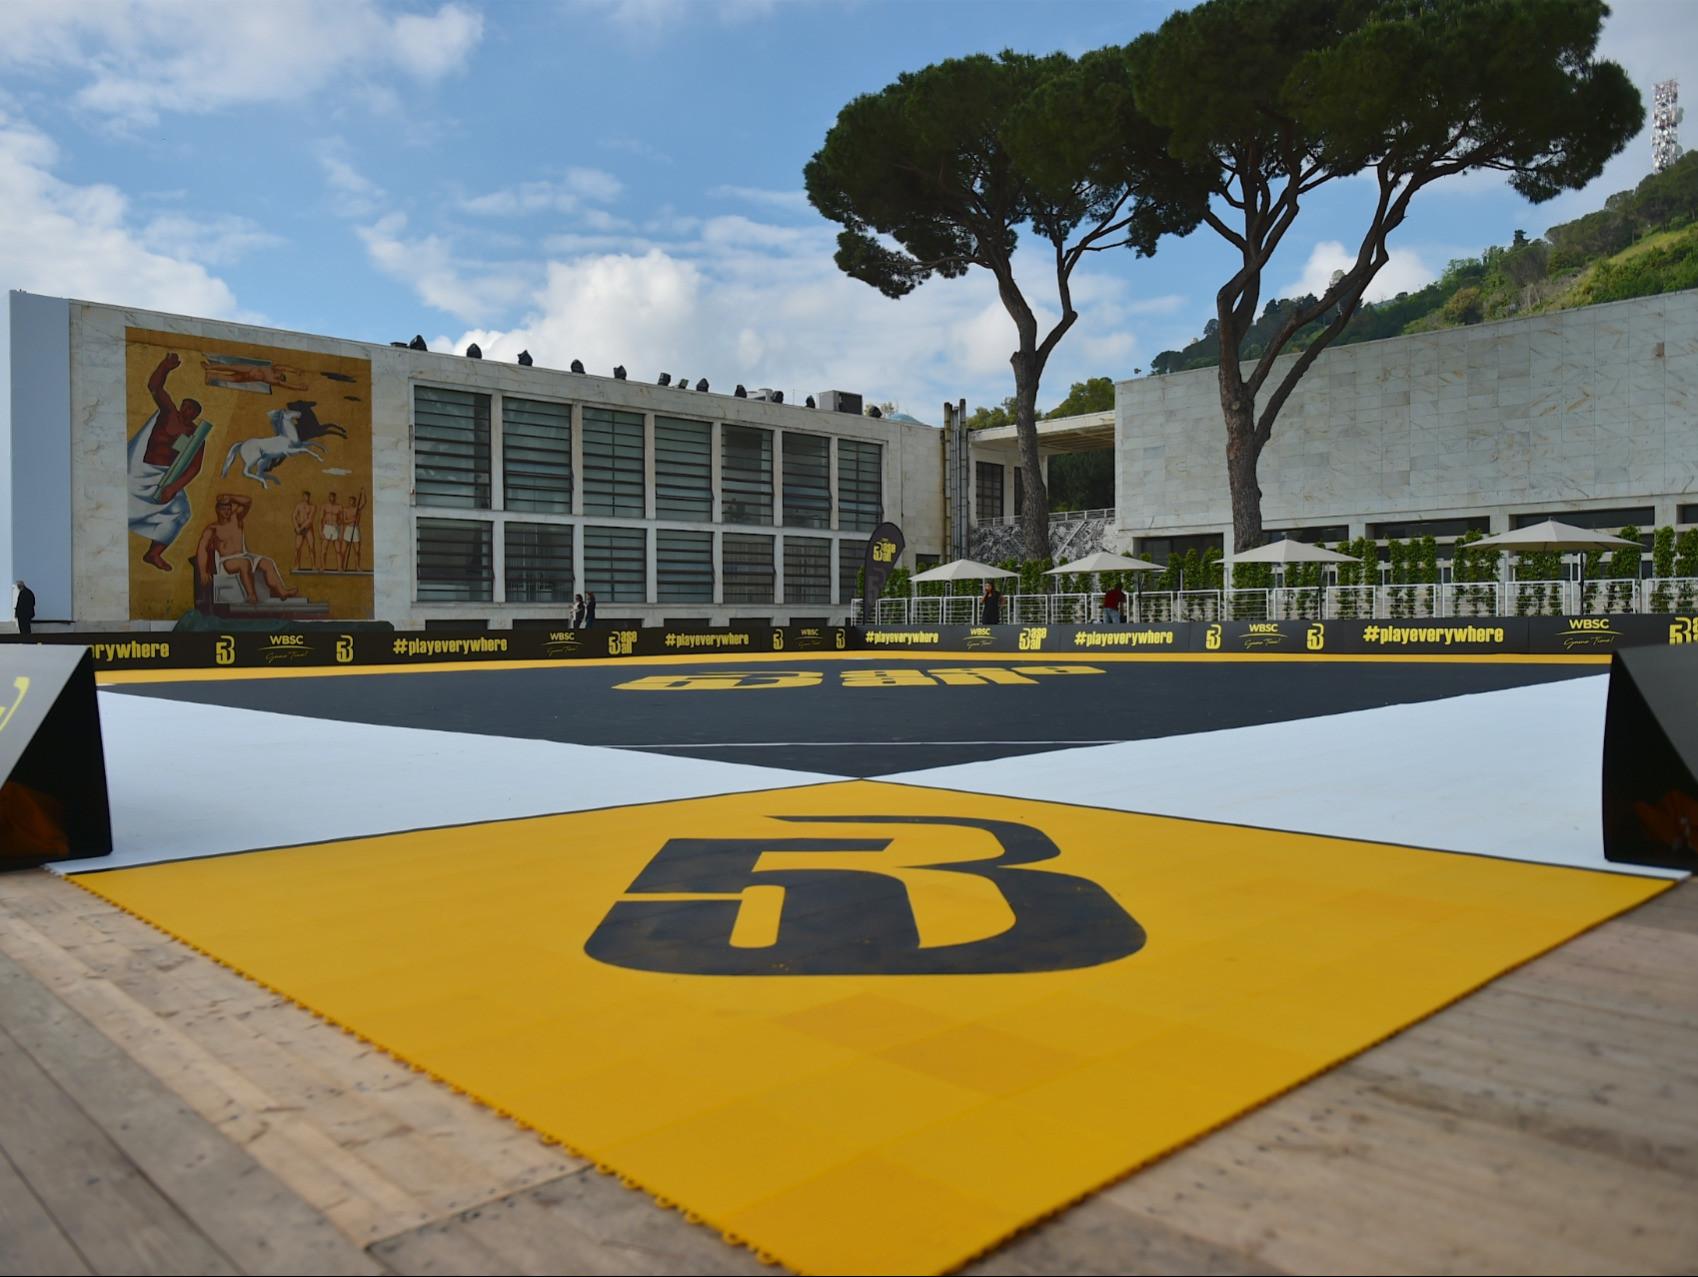 Italian Baseball and Softball Federation recognises Baseball5 as an official discipline